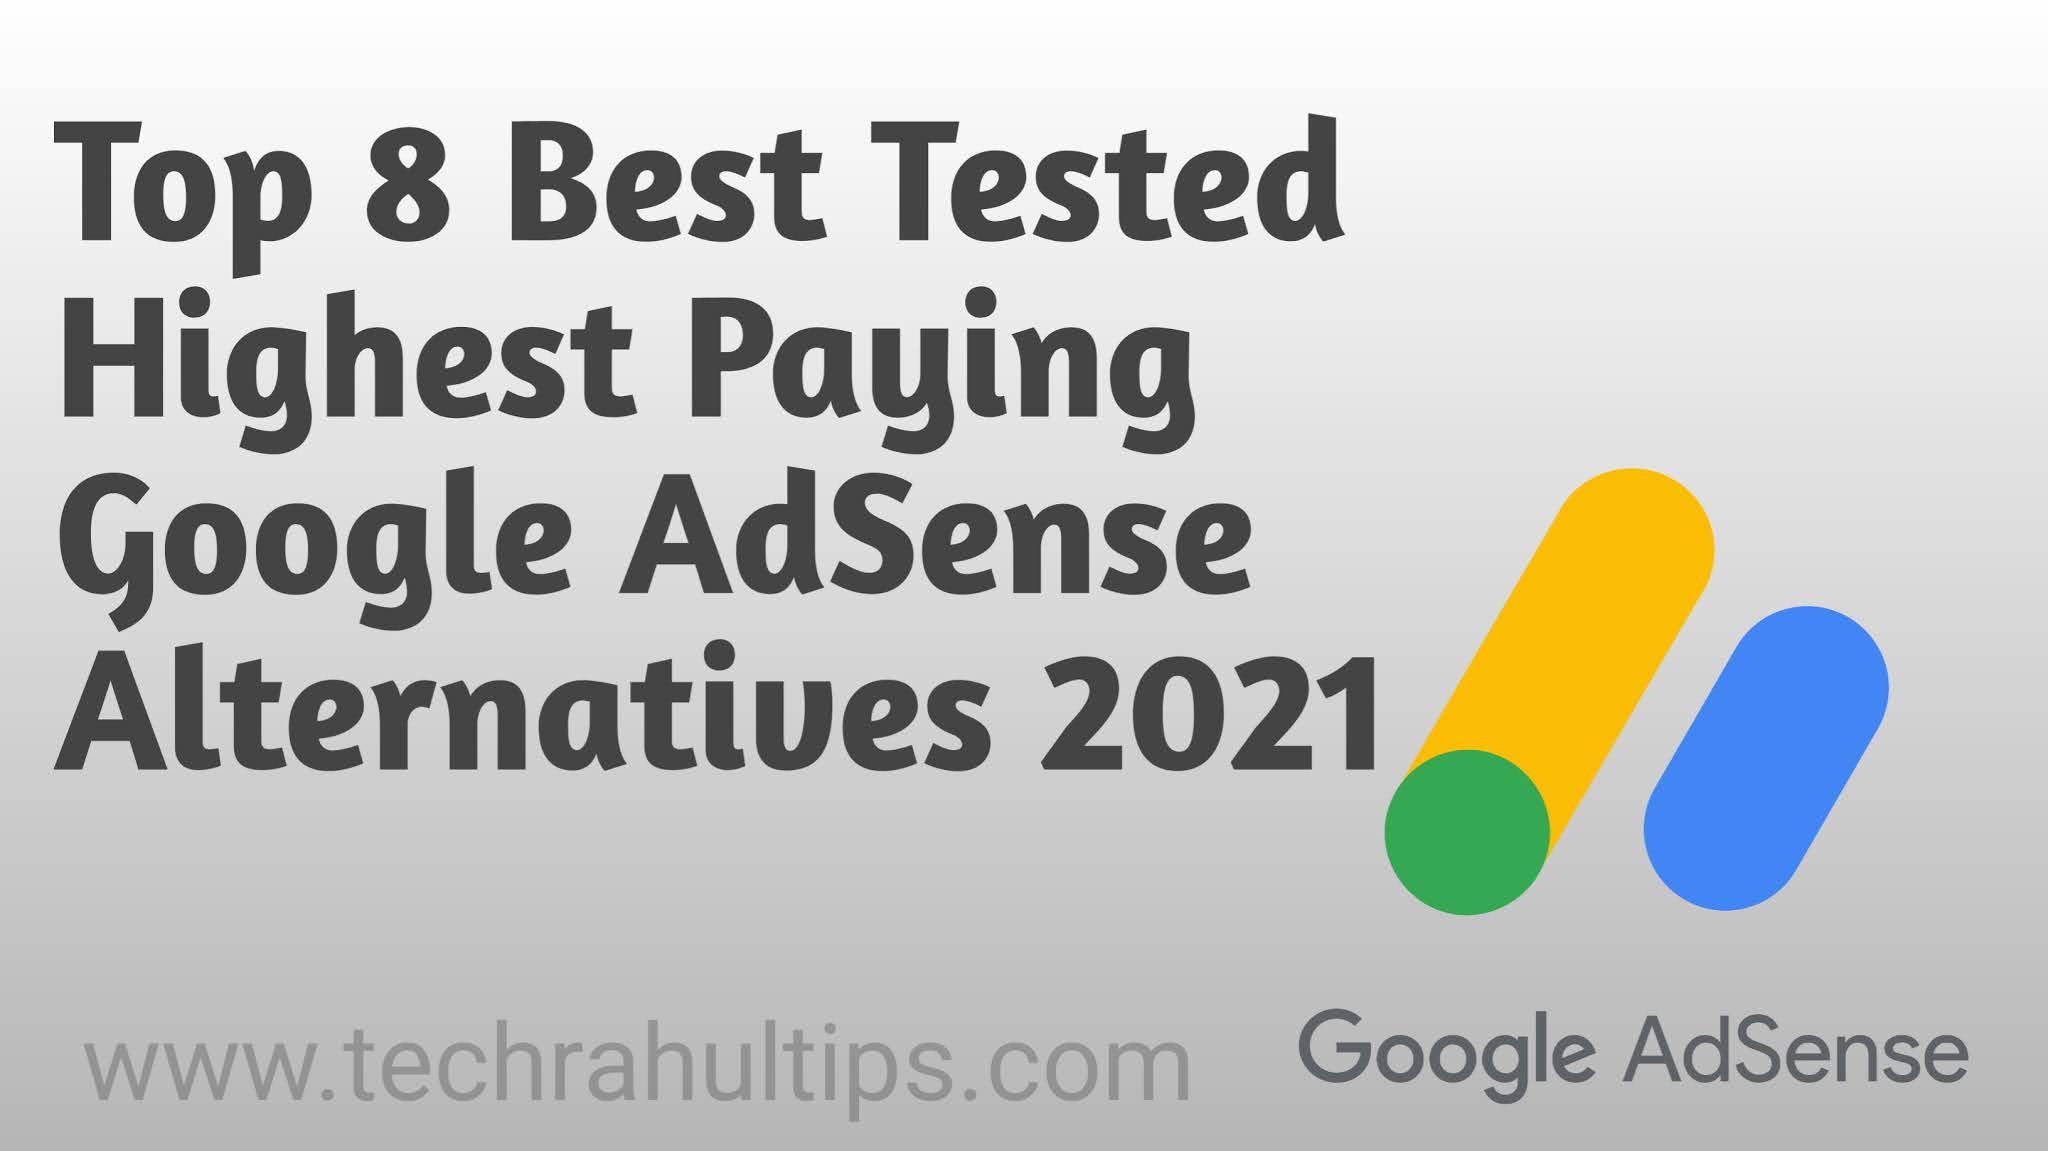 Top 8 Best Highest Paying Google AdSense Alternatives 2021